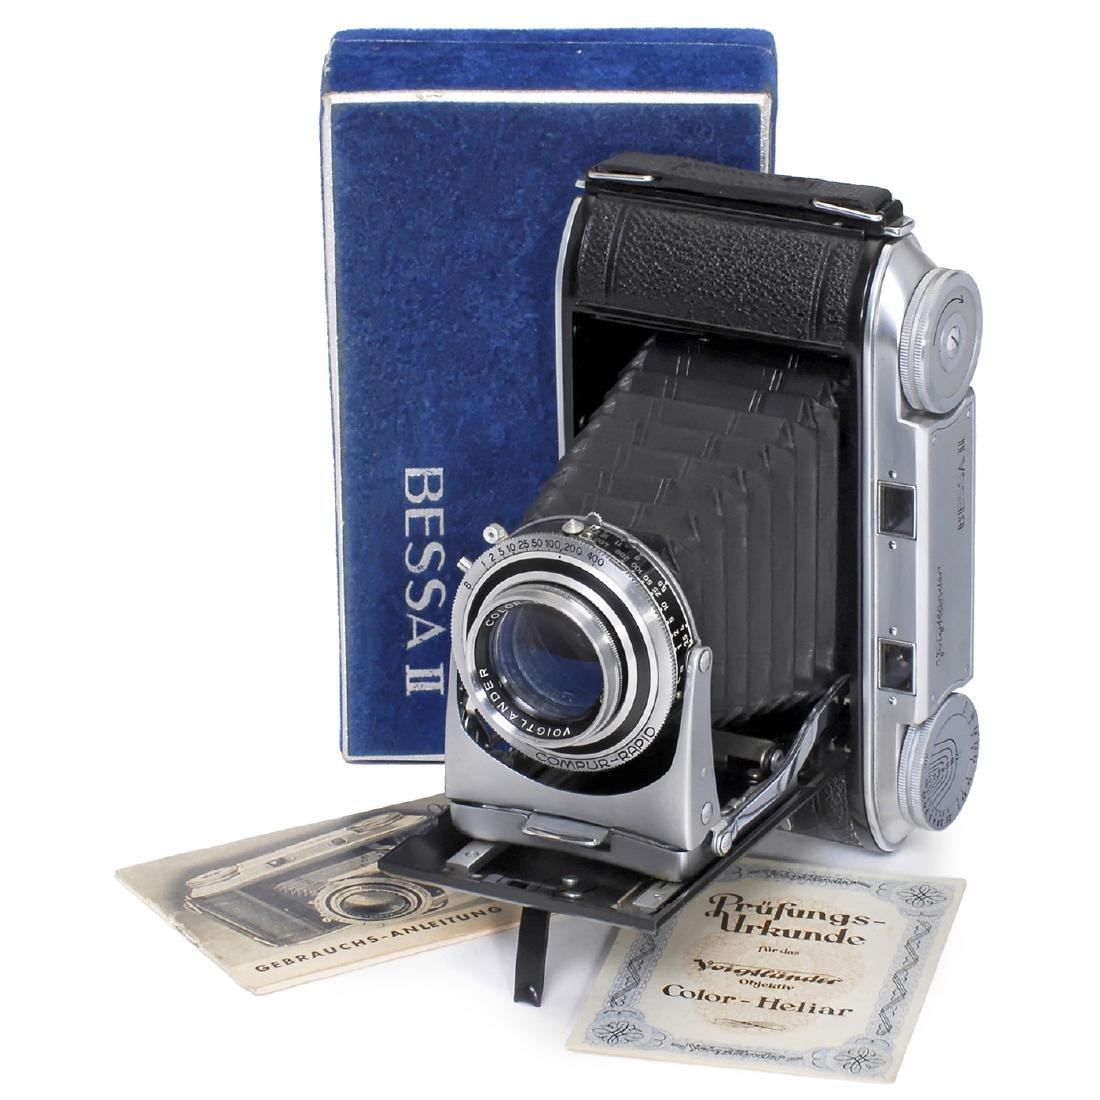 Bessa II with Color-Heliar, 1950